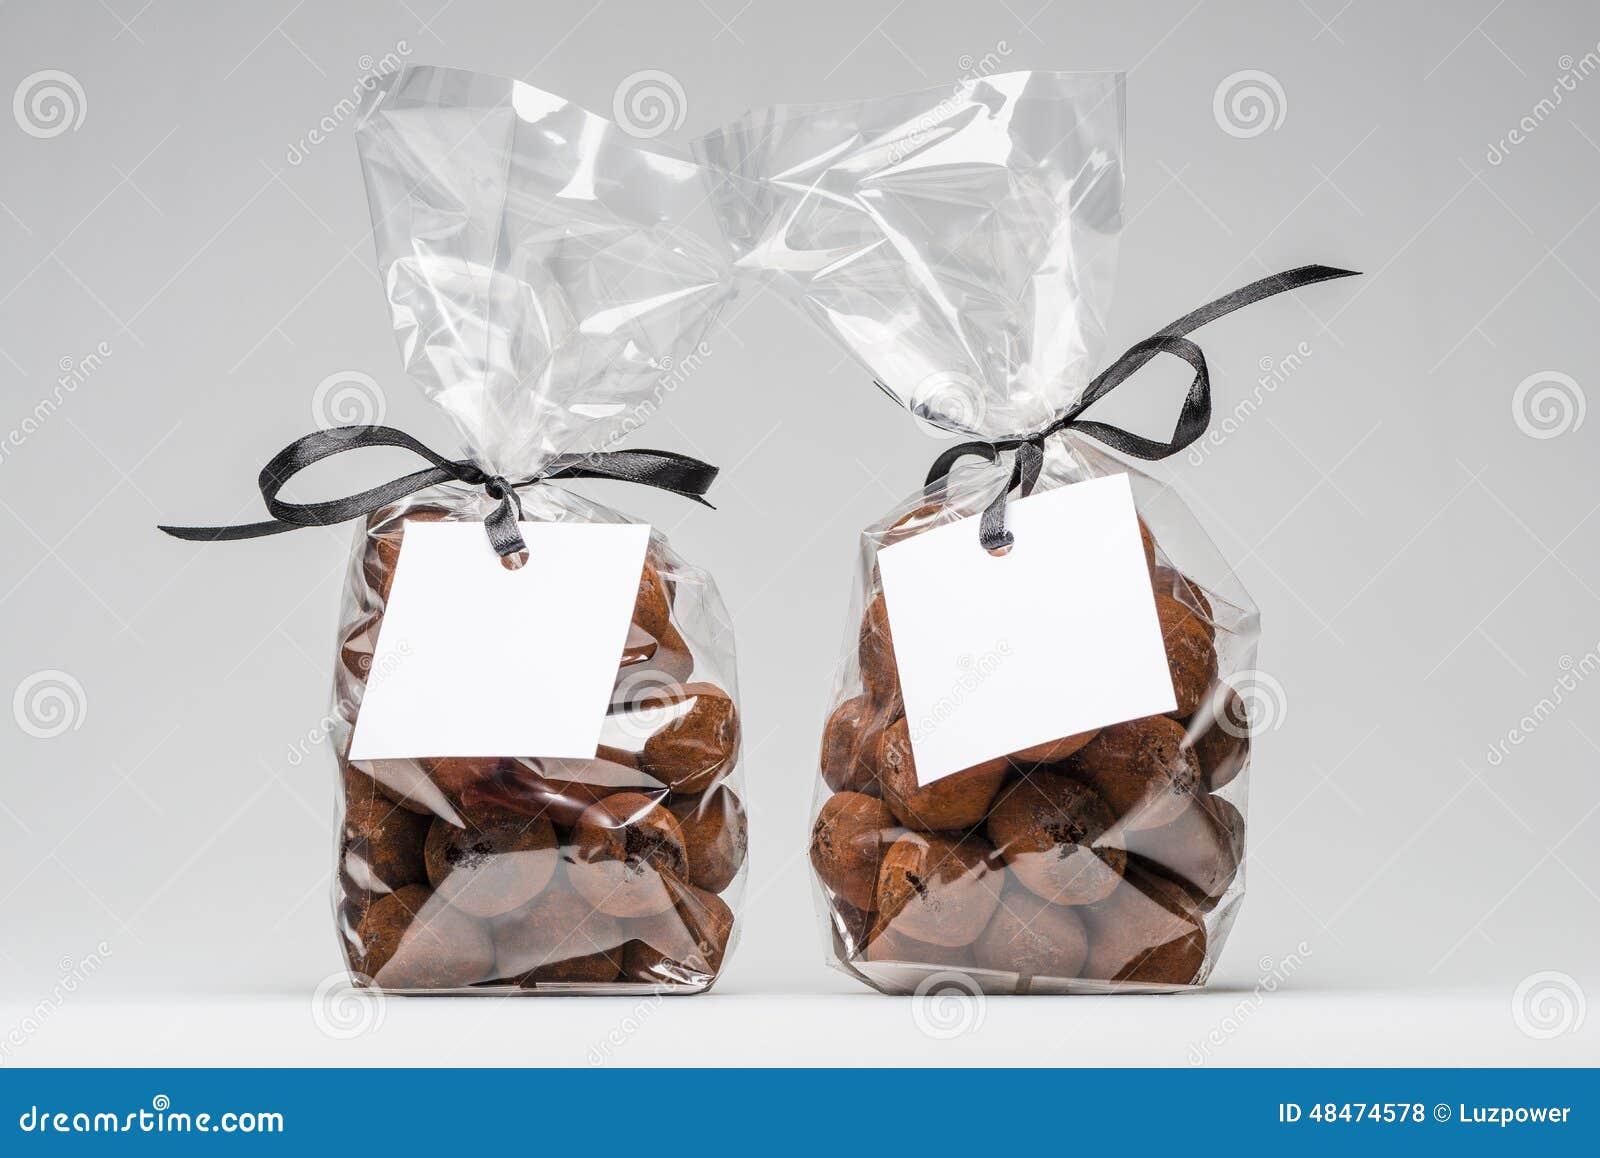 Two Elegant Plastic Bags Of Chocolate Truffles For Christmas Gif ...